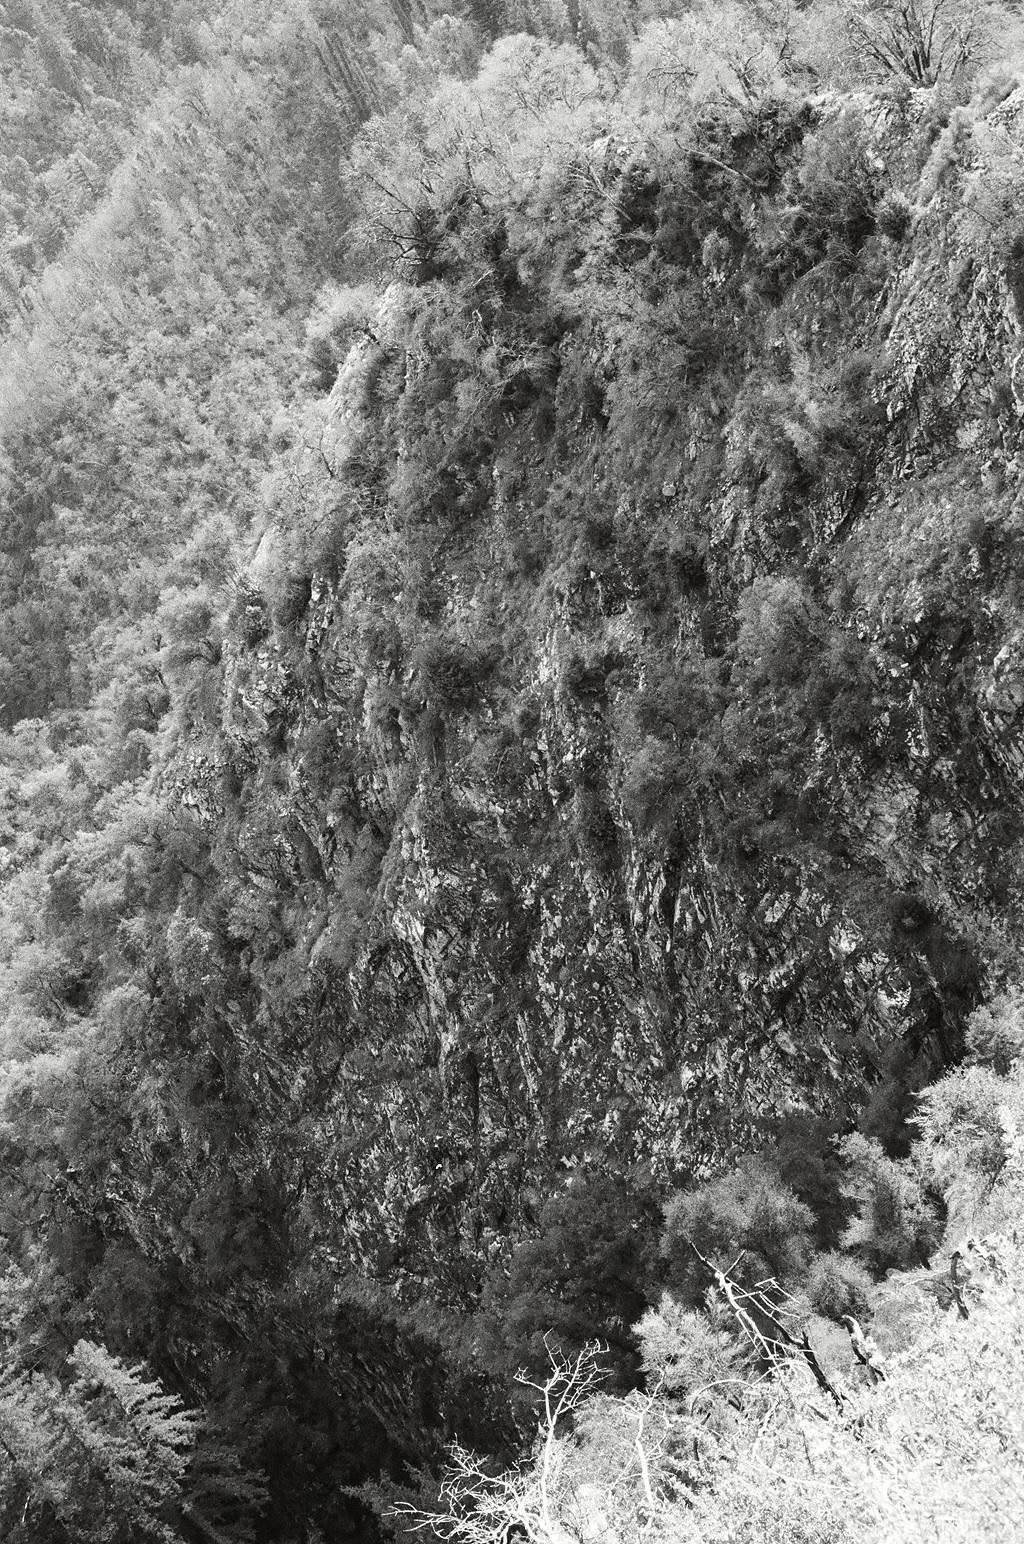 Big Sur, s ilver print,2014